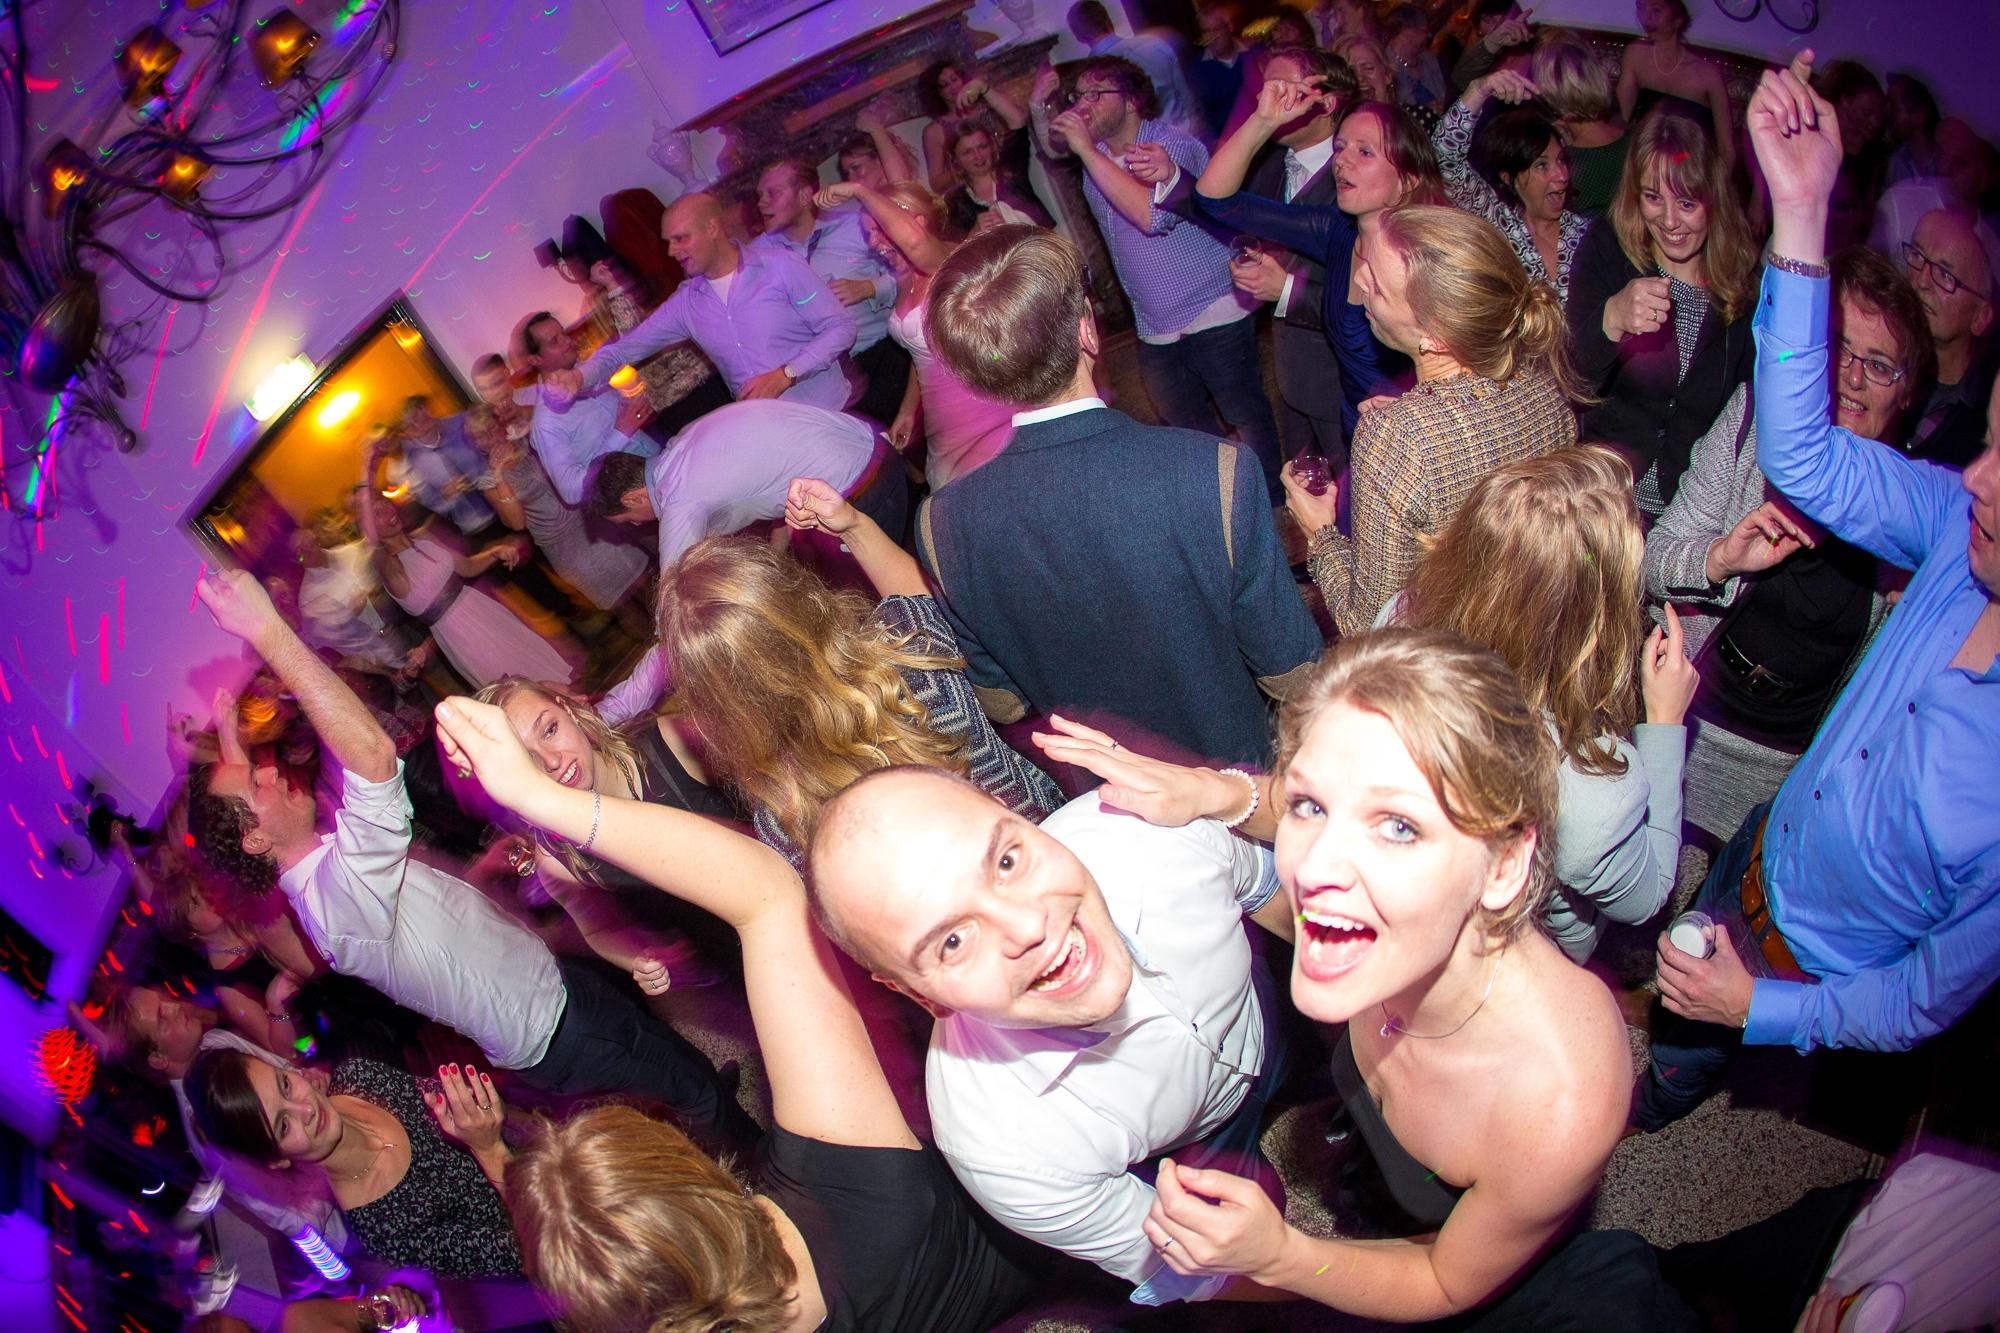 bruidsfotografie-trouwreportage-huwelijksfotografie-bruidsfotograaf-feestfotografie-Ingeborg en Martijn-49.jpg